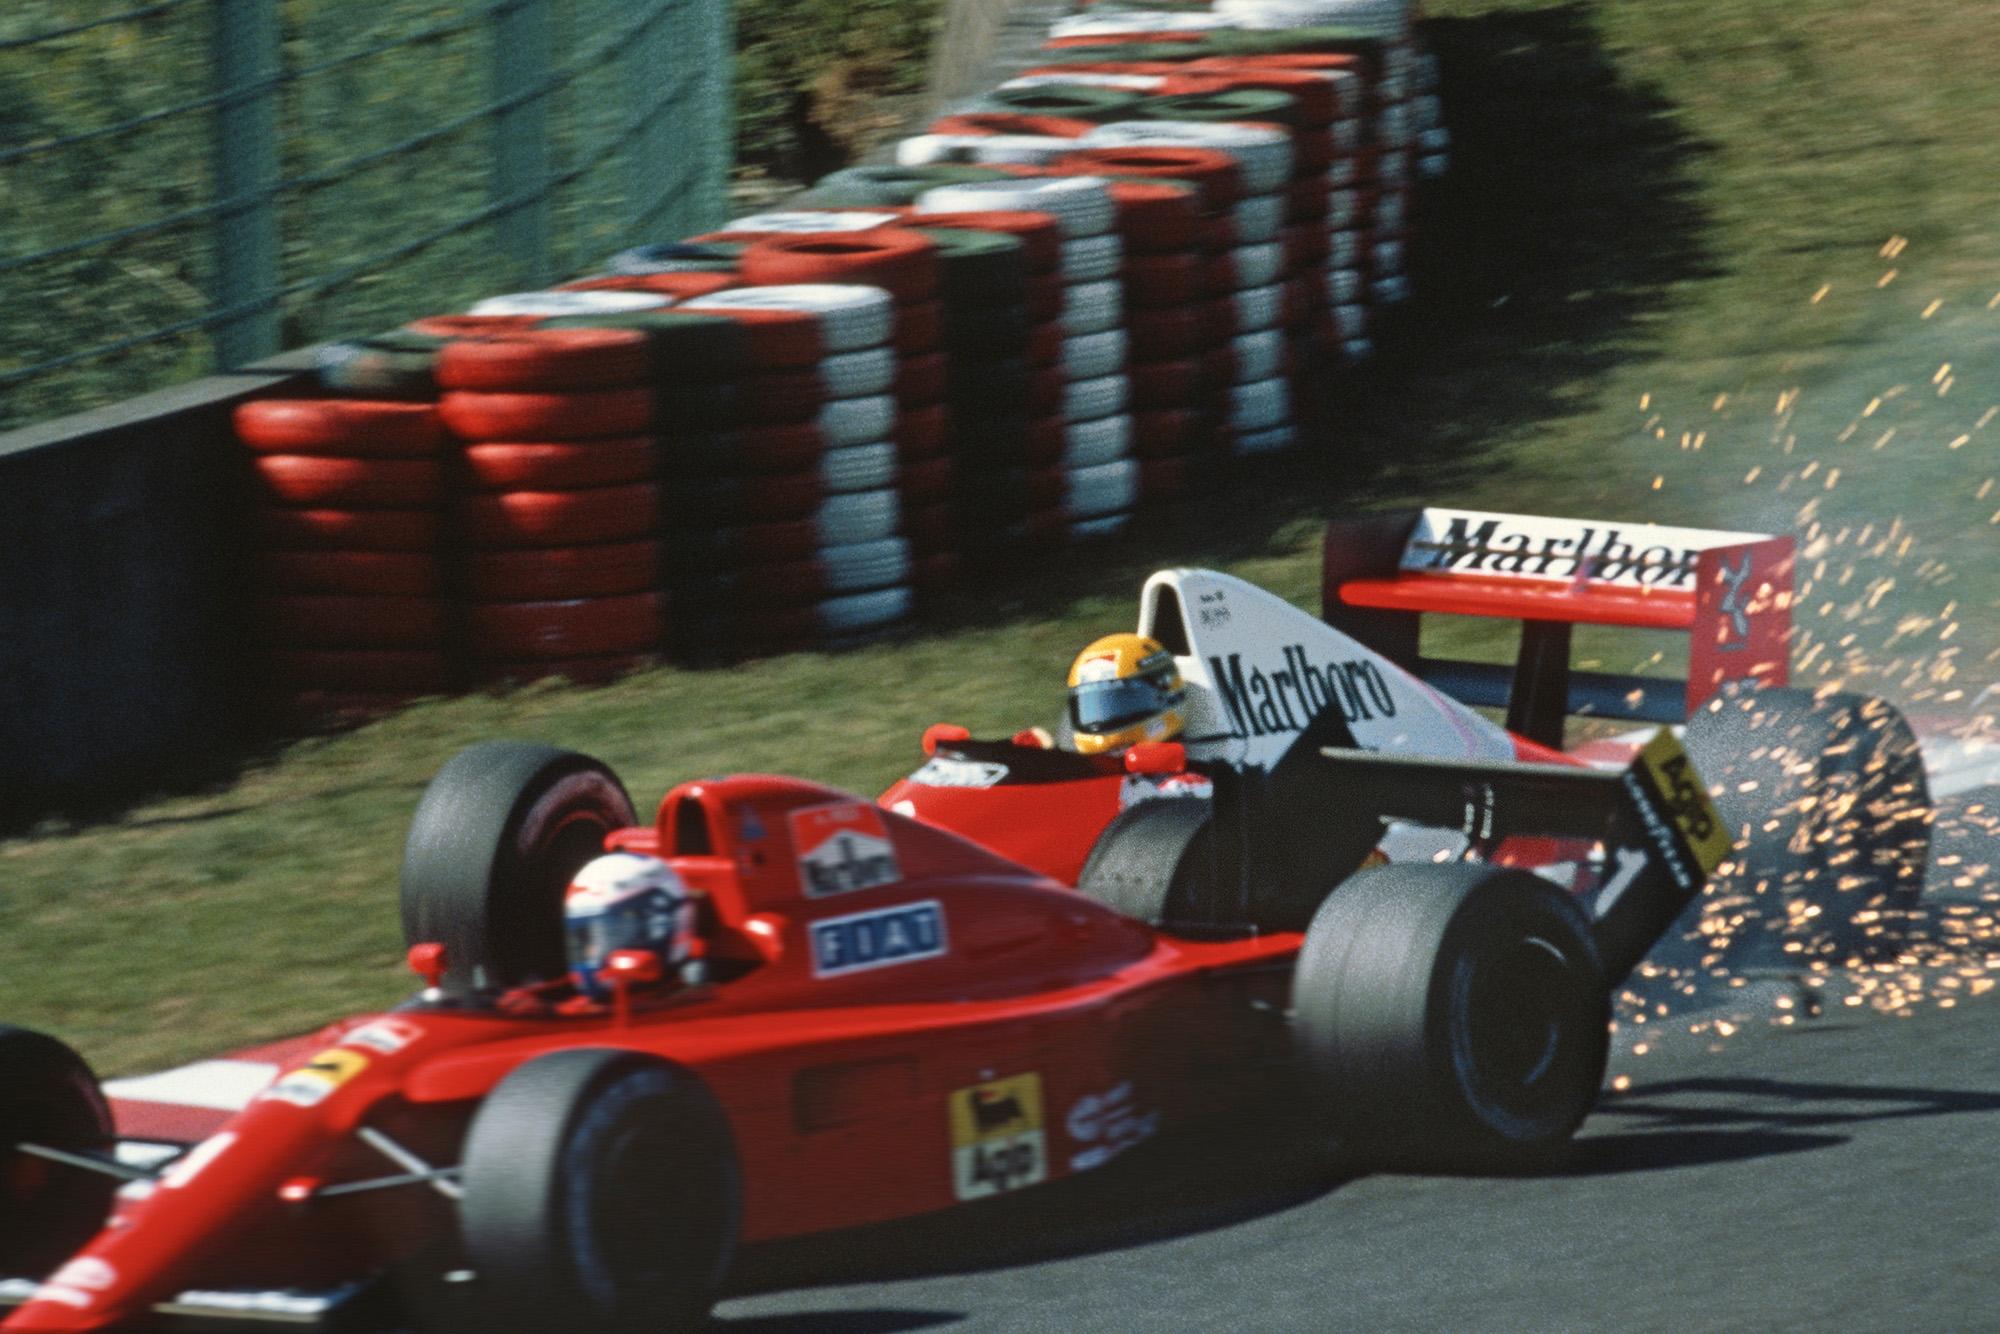 Ayrton Senna hits Alain Prost at the start of the 1990 Japanese Grand Prix